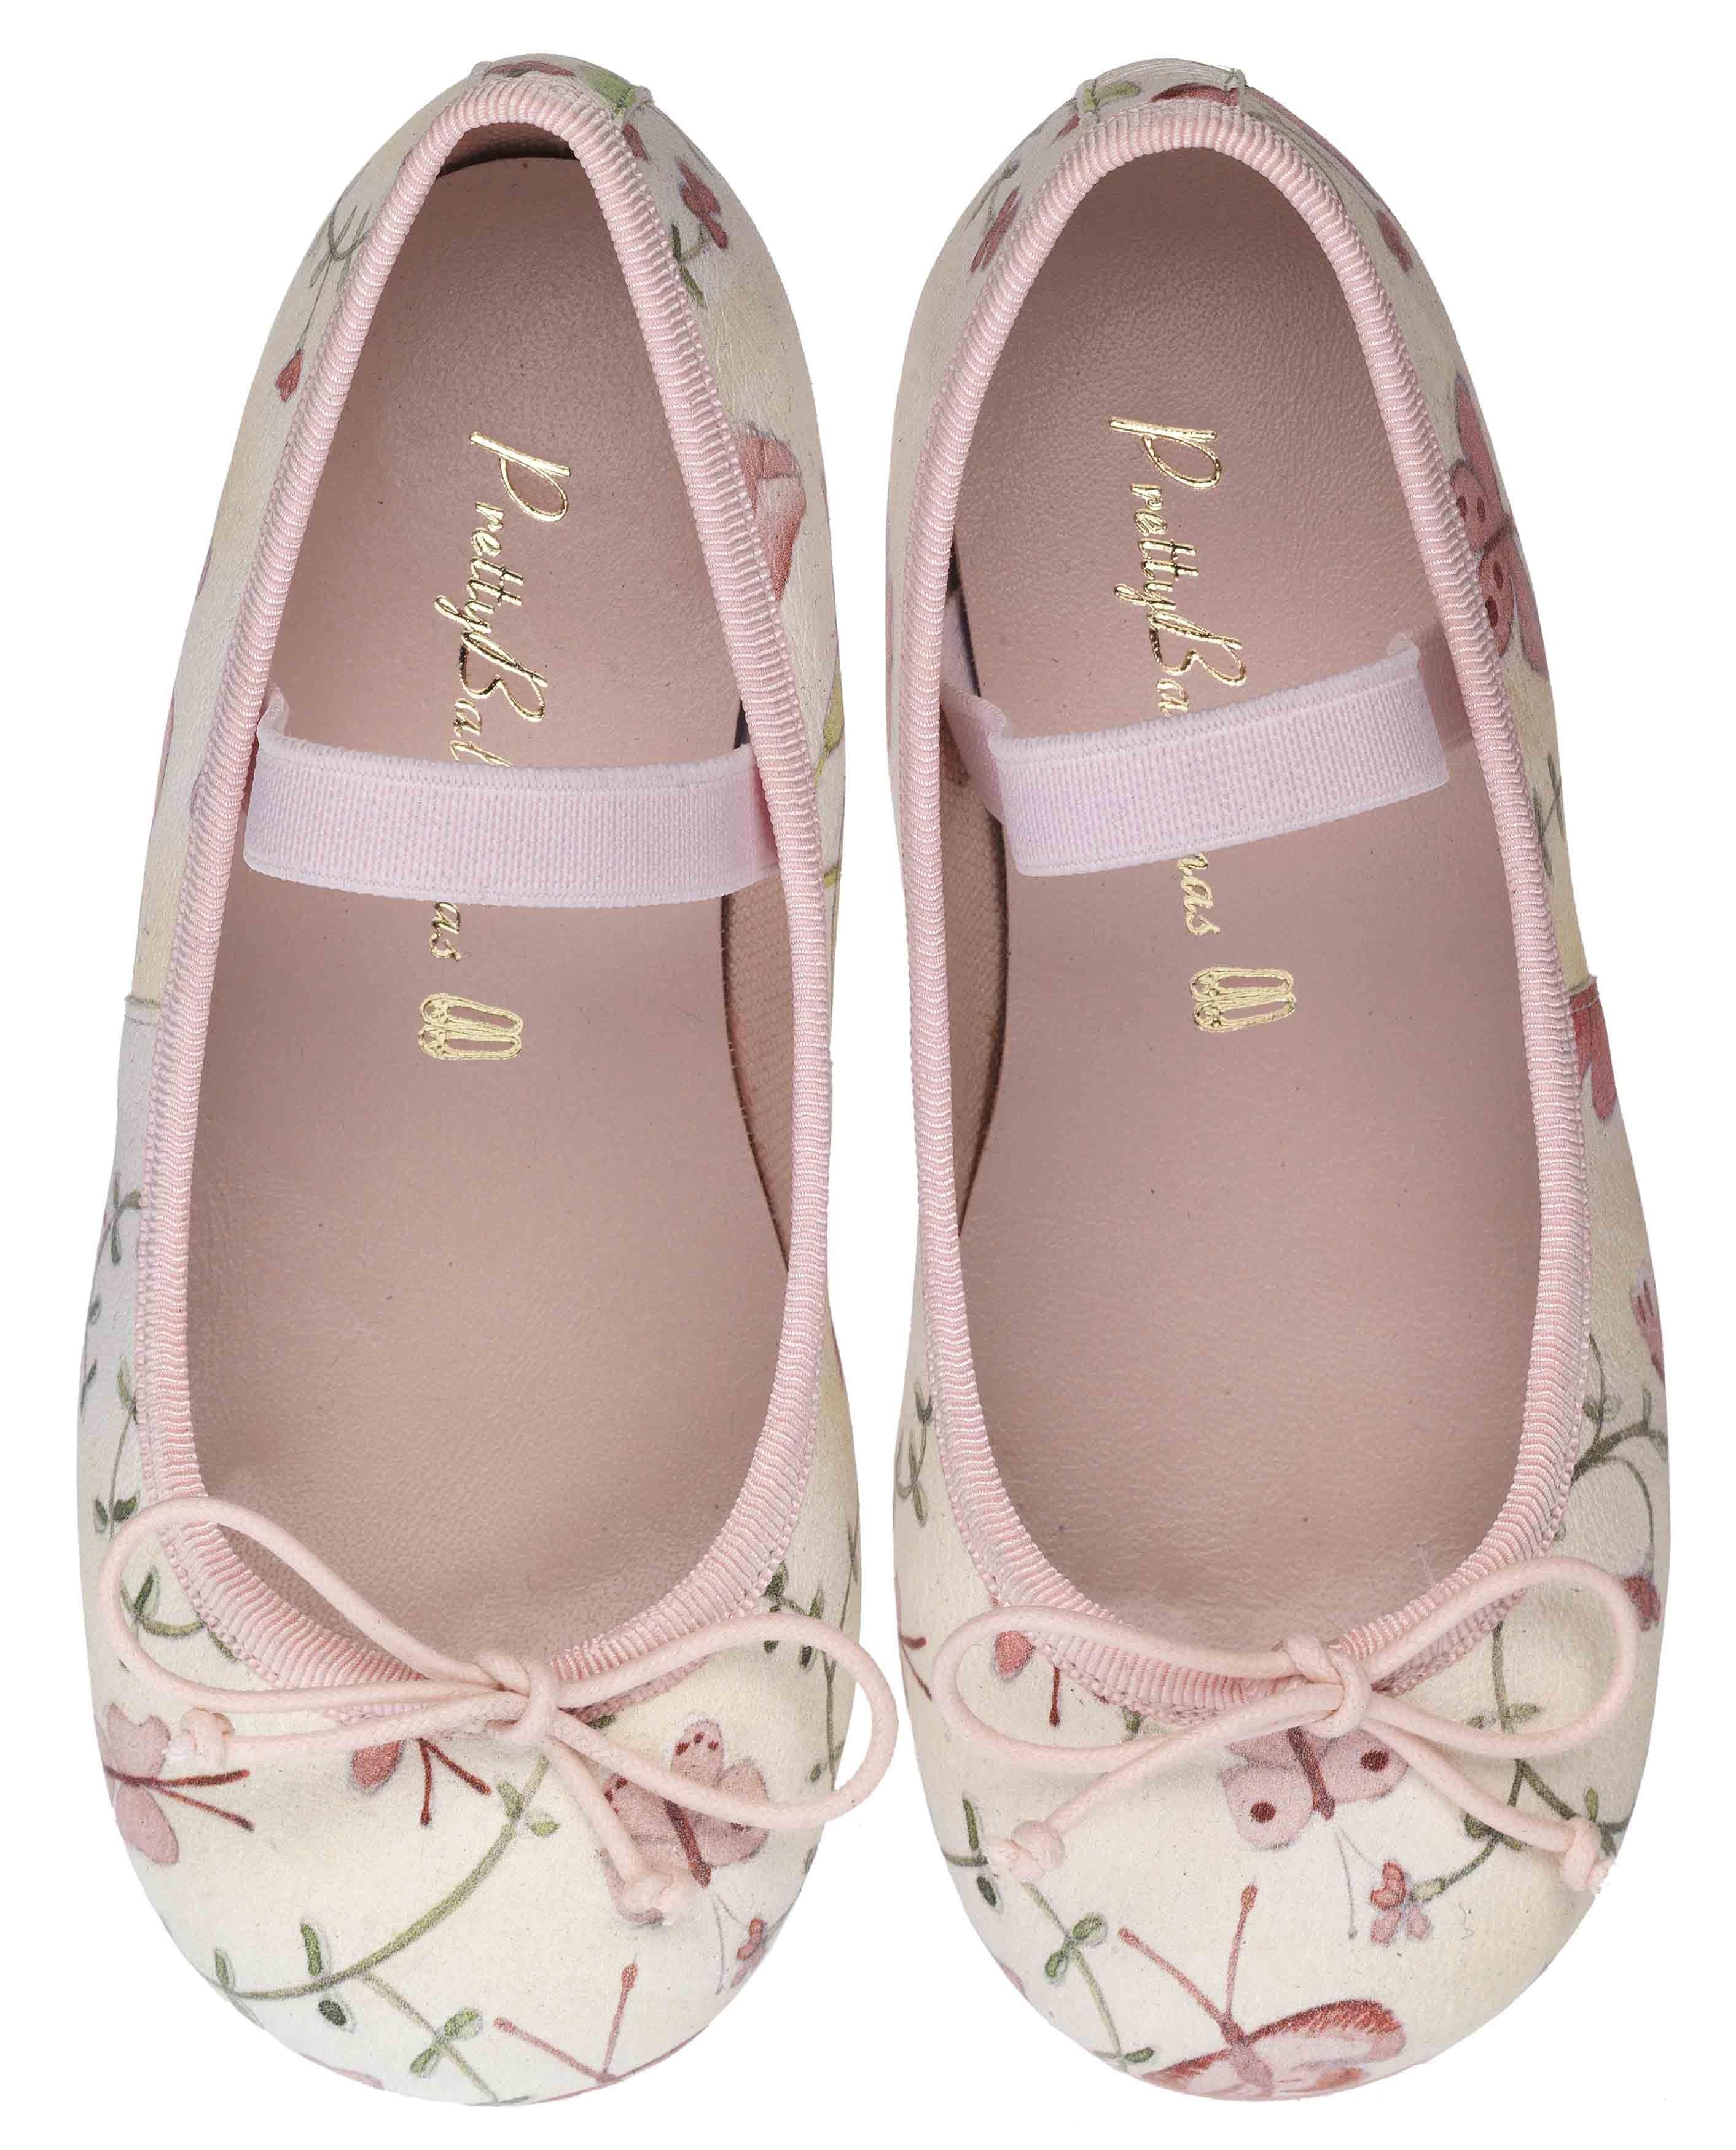 Pretty Ballerinas Cute Girl Shoes a917e5260678